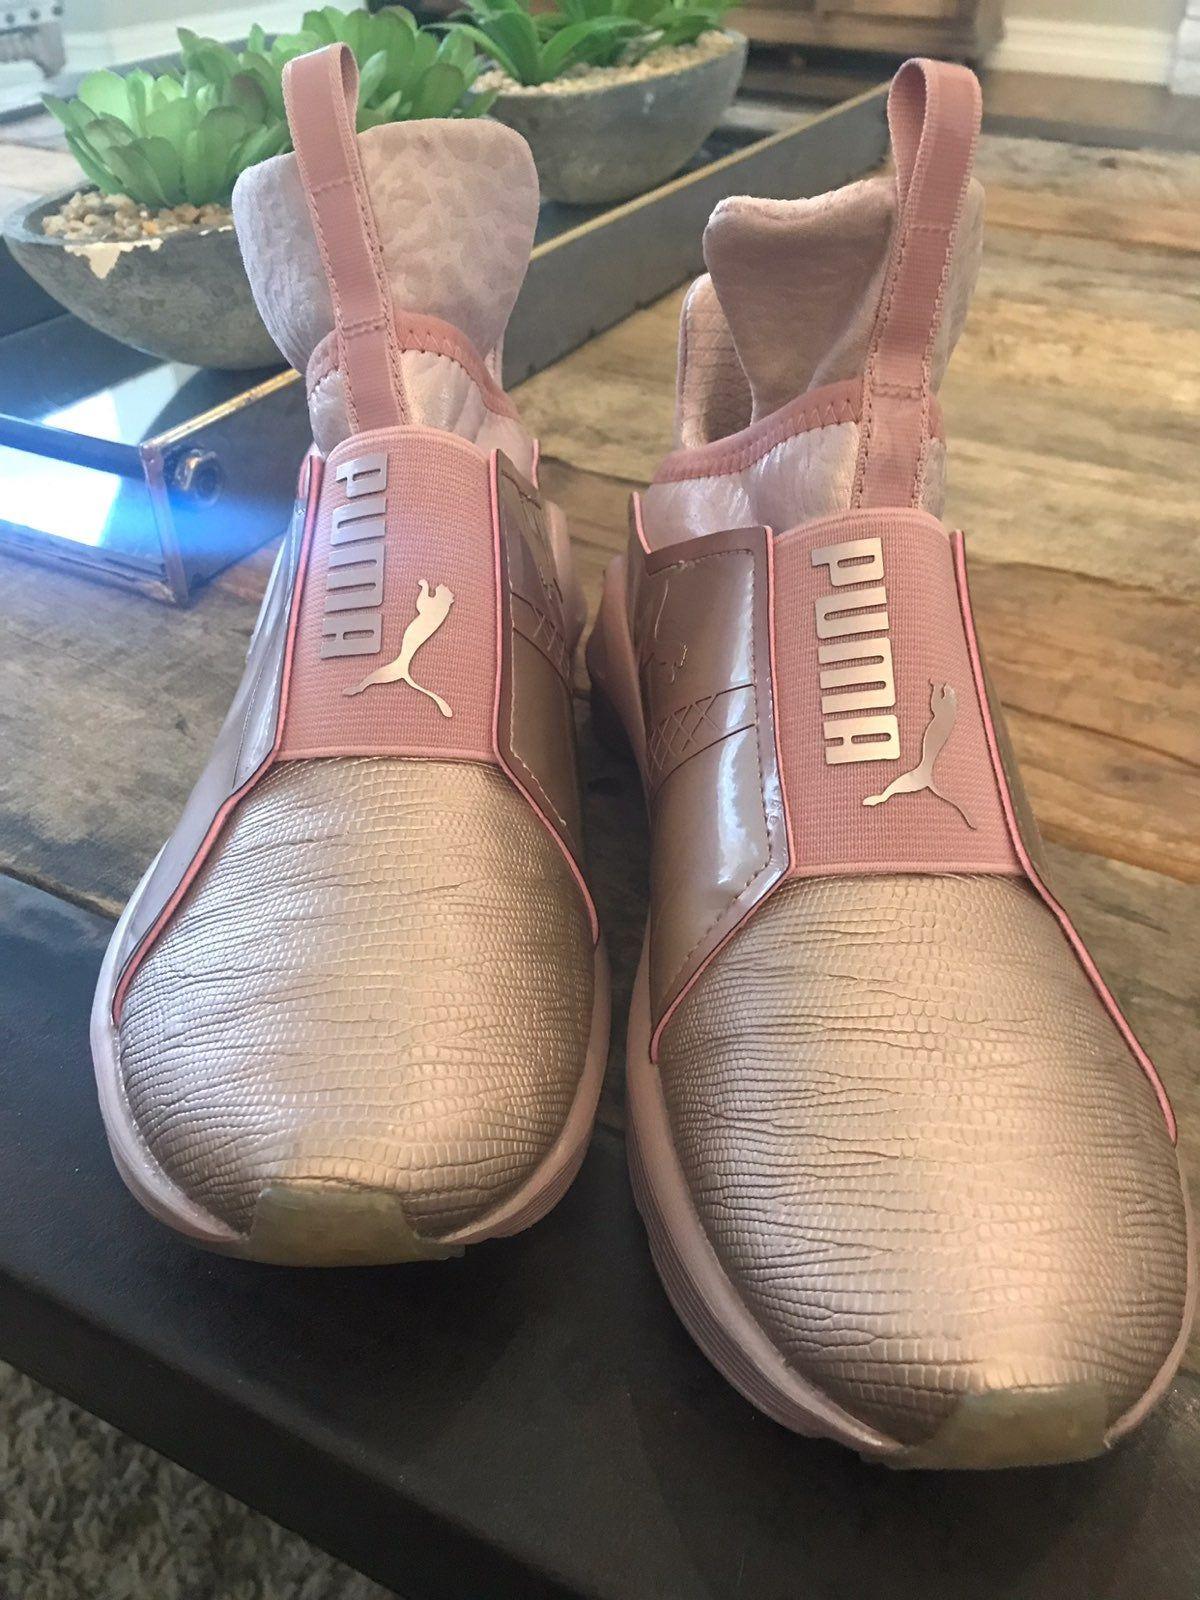 Pin on PUMA Fashion sneakers